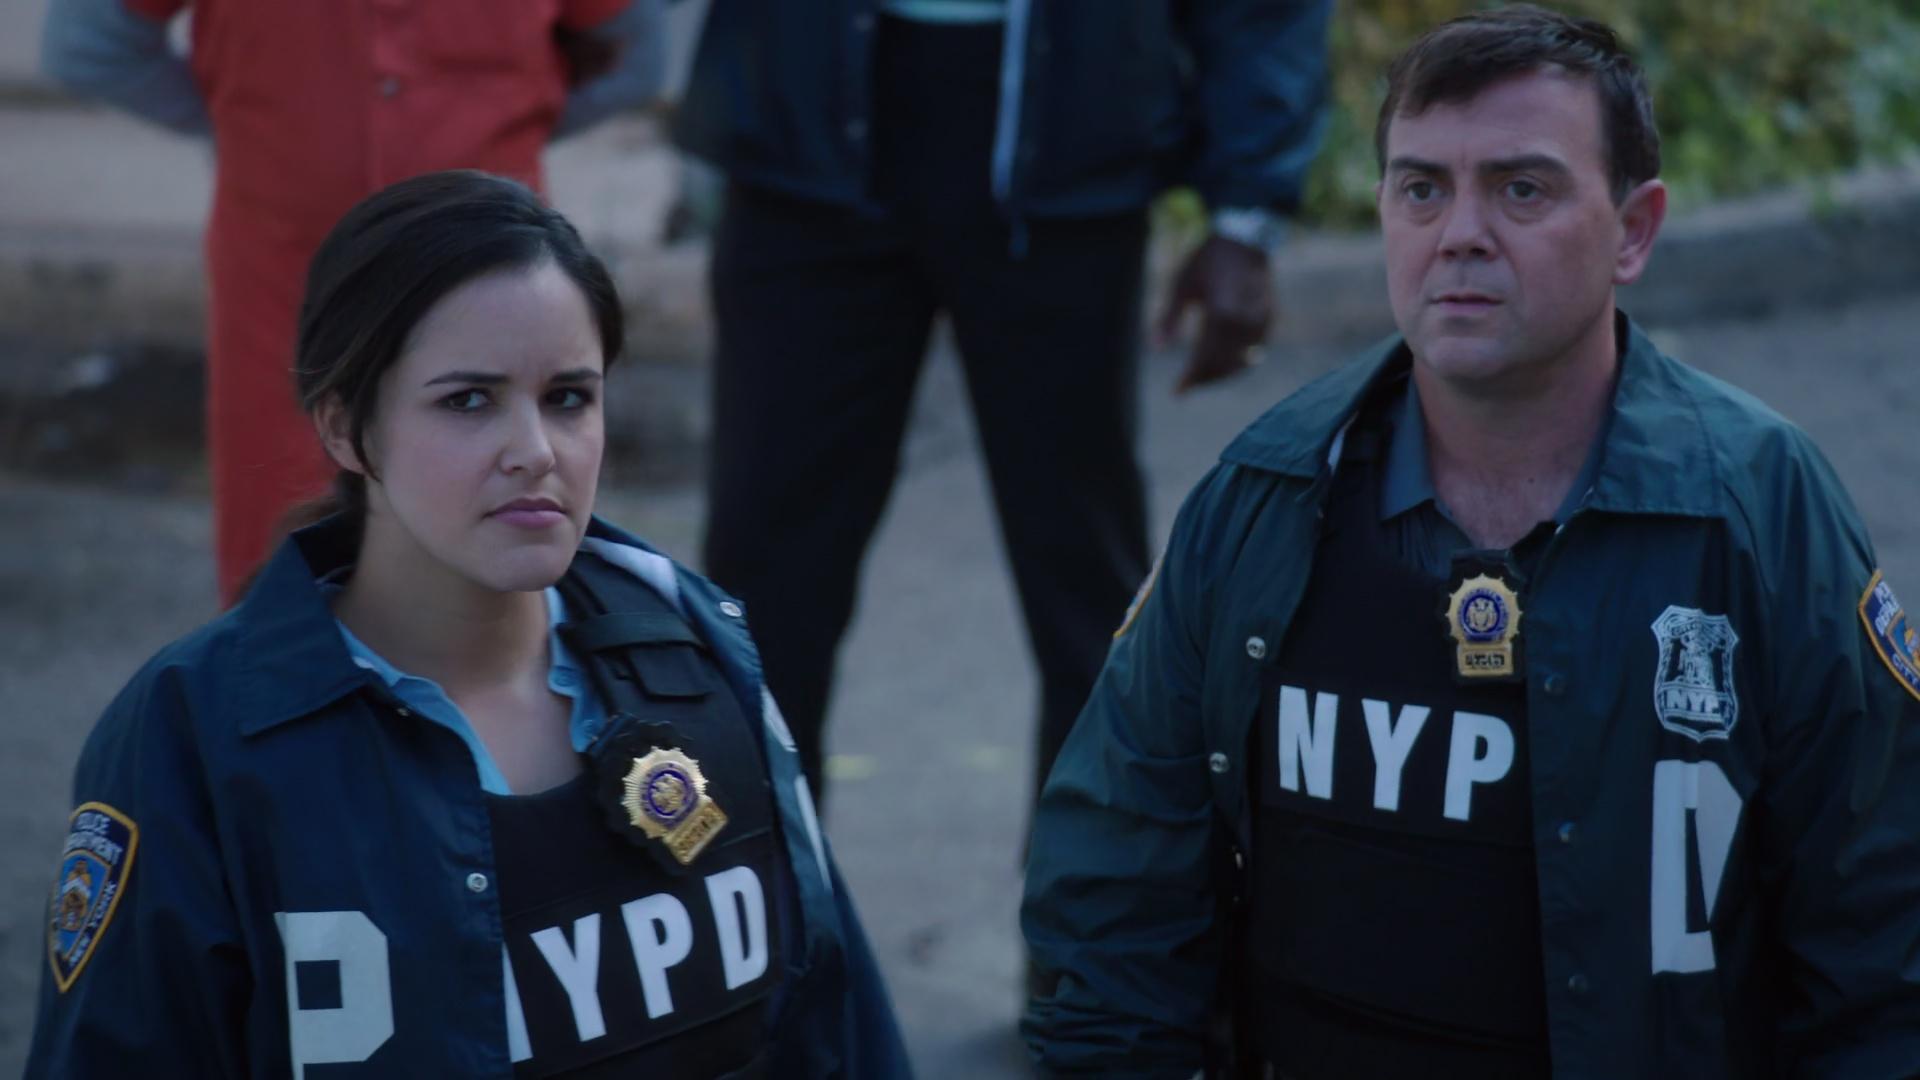 Brooklyn Nine-Nine (2013) Season 4 x265 10 Bits 1080p